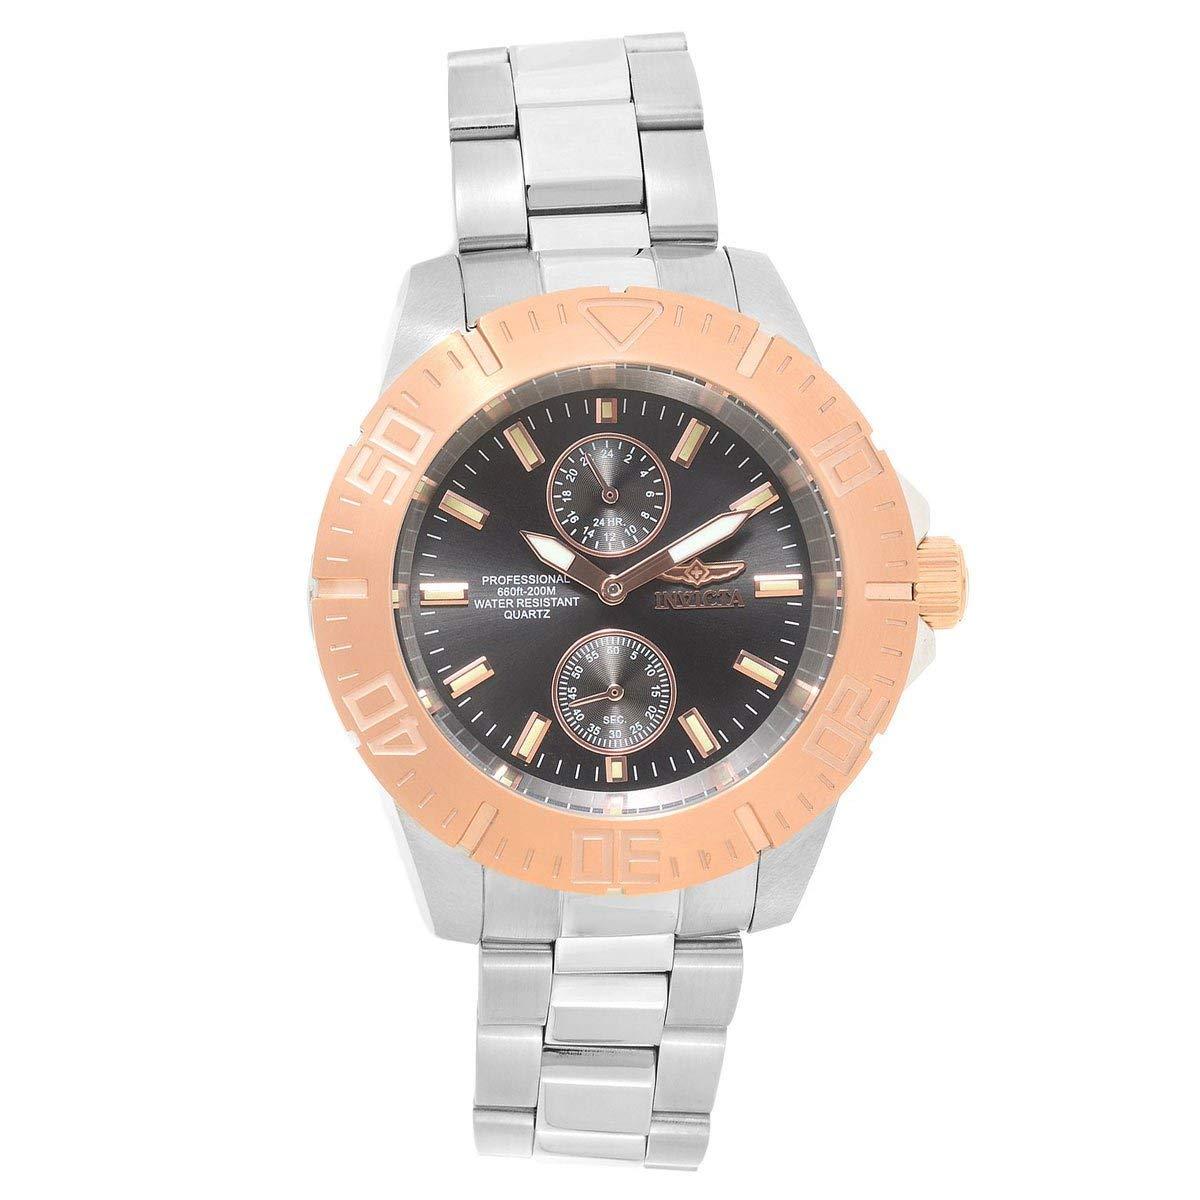 Invicta Men's 'Pro Diver' Quartz Stainless Steel Diving Watch, Color:Silver-Toned (Model: 23641)